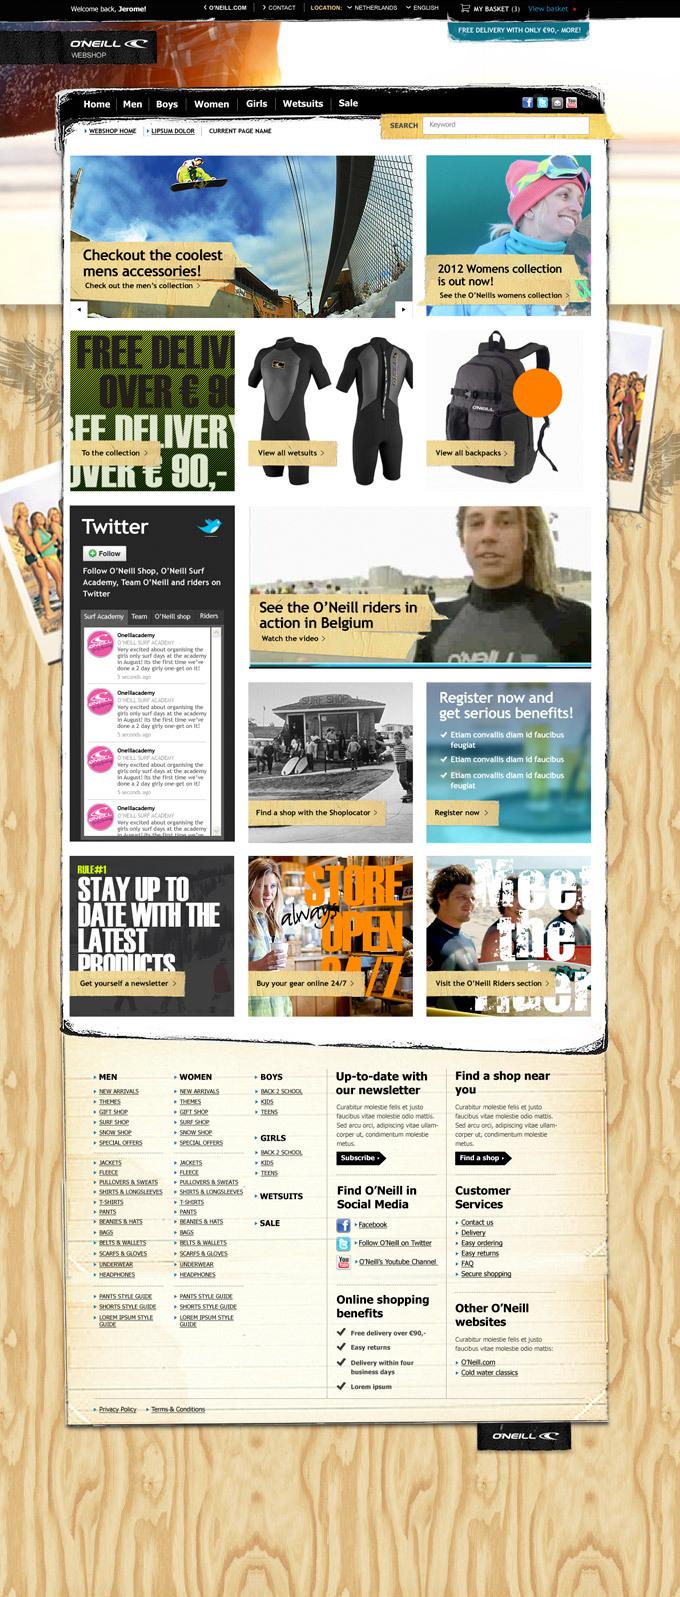 Afbeelding 2 van 7 - O'Neill global webshop re-design - Homepage en algehele stijl variant 2